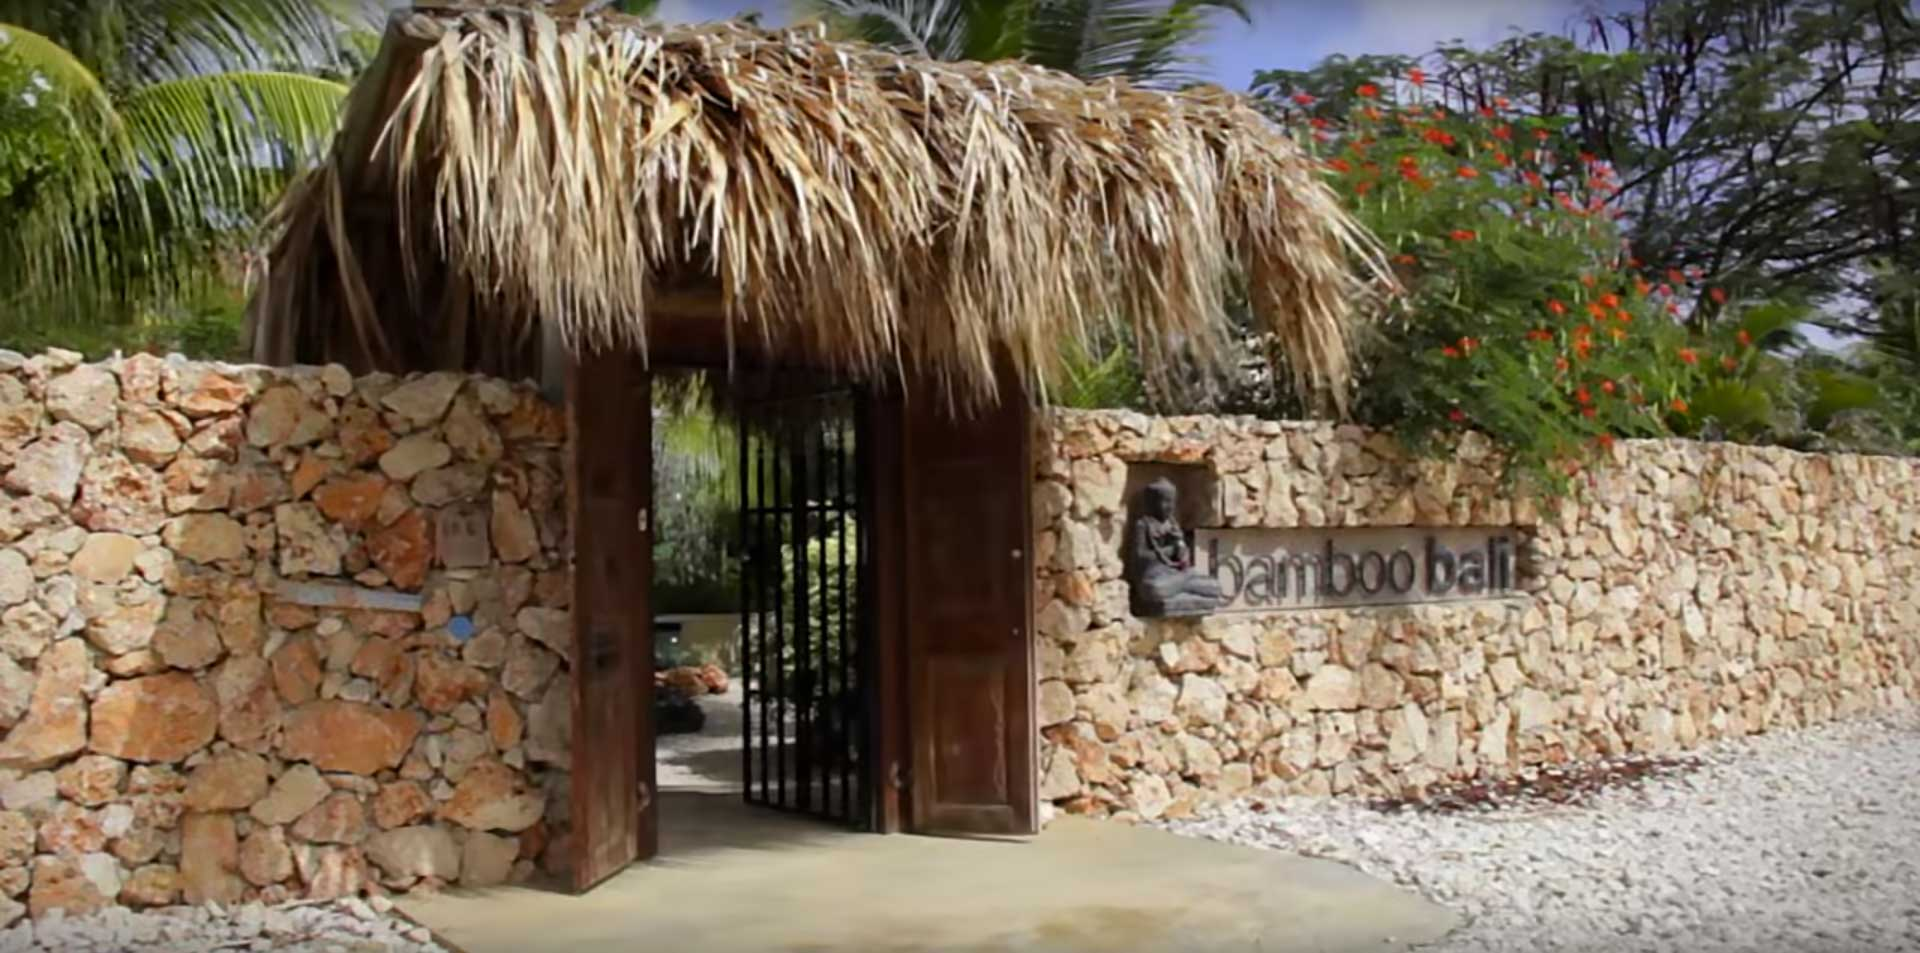 bamboo bali hotel bonaire